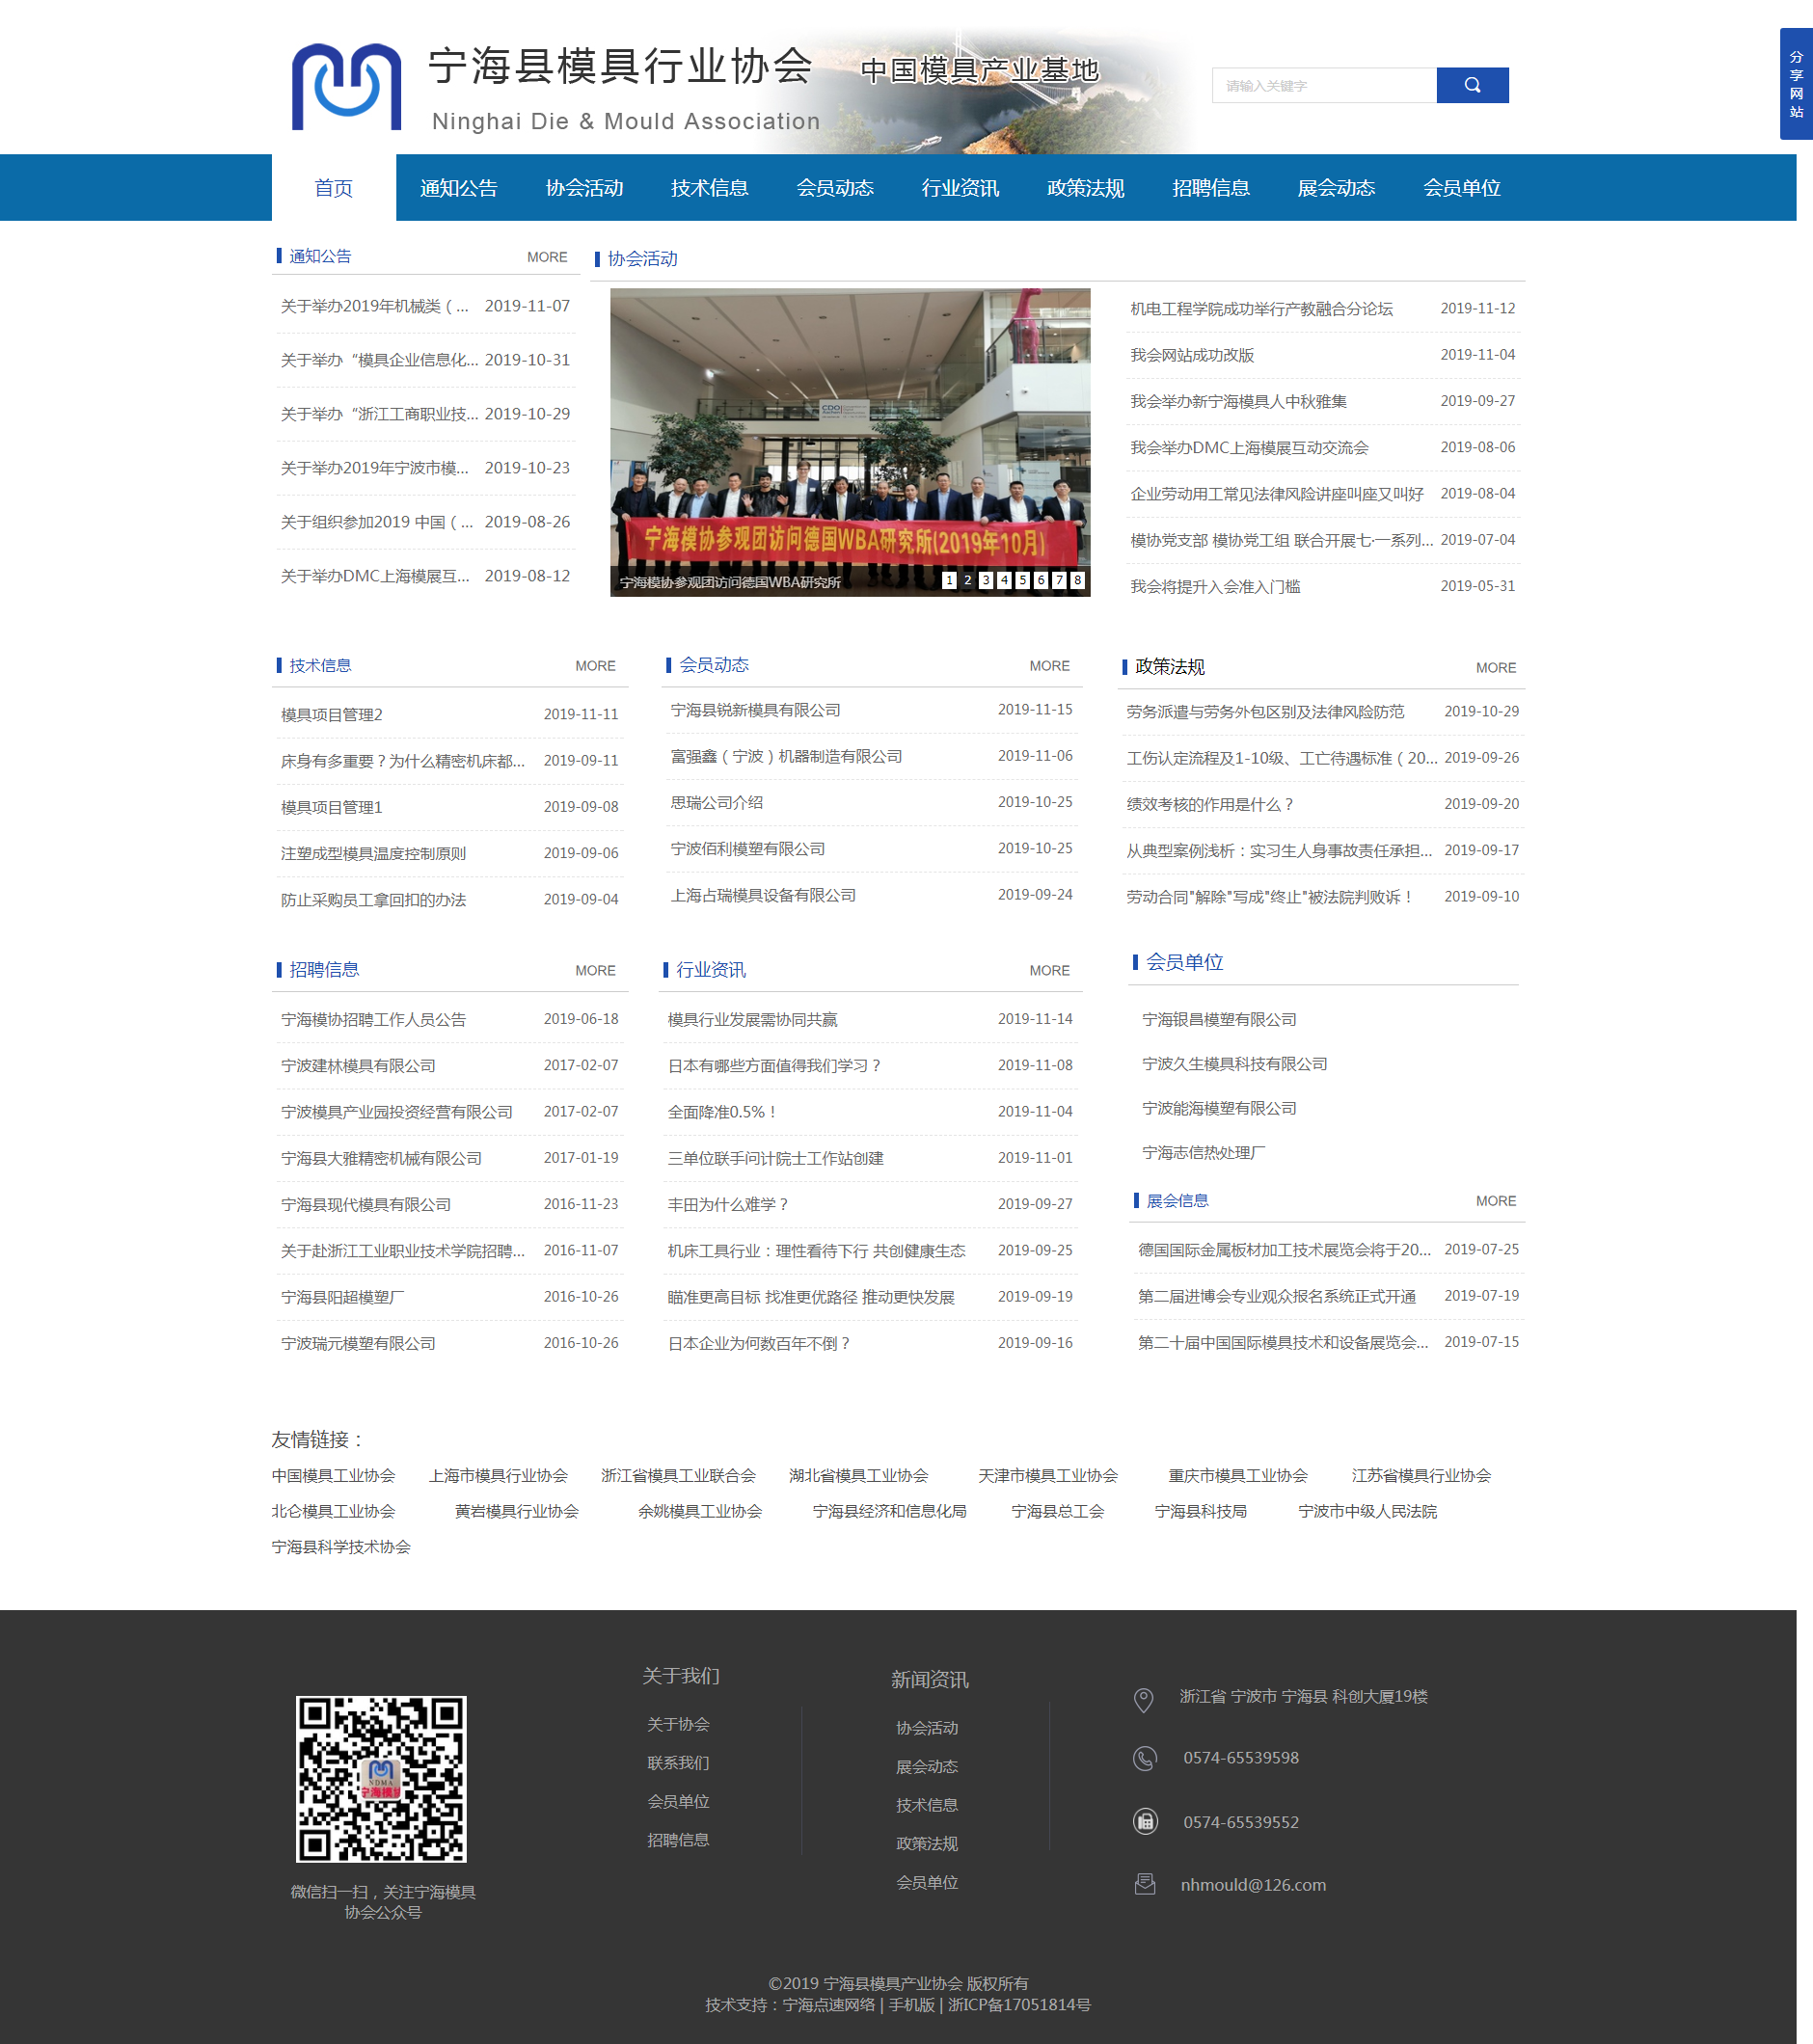 3d杀码定胆县模具行业协会-中国模具产业基地-3d杀码定胆模具协会.png